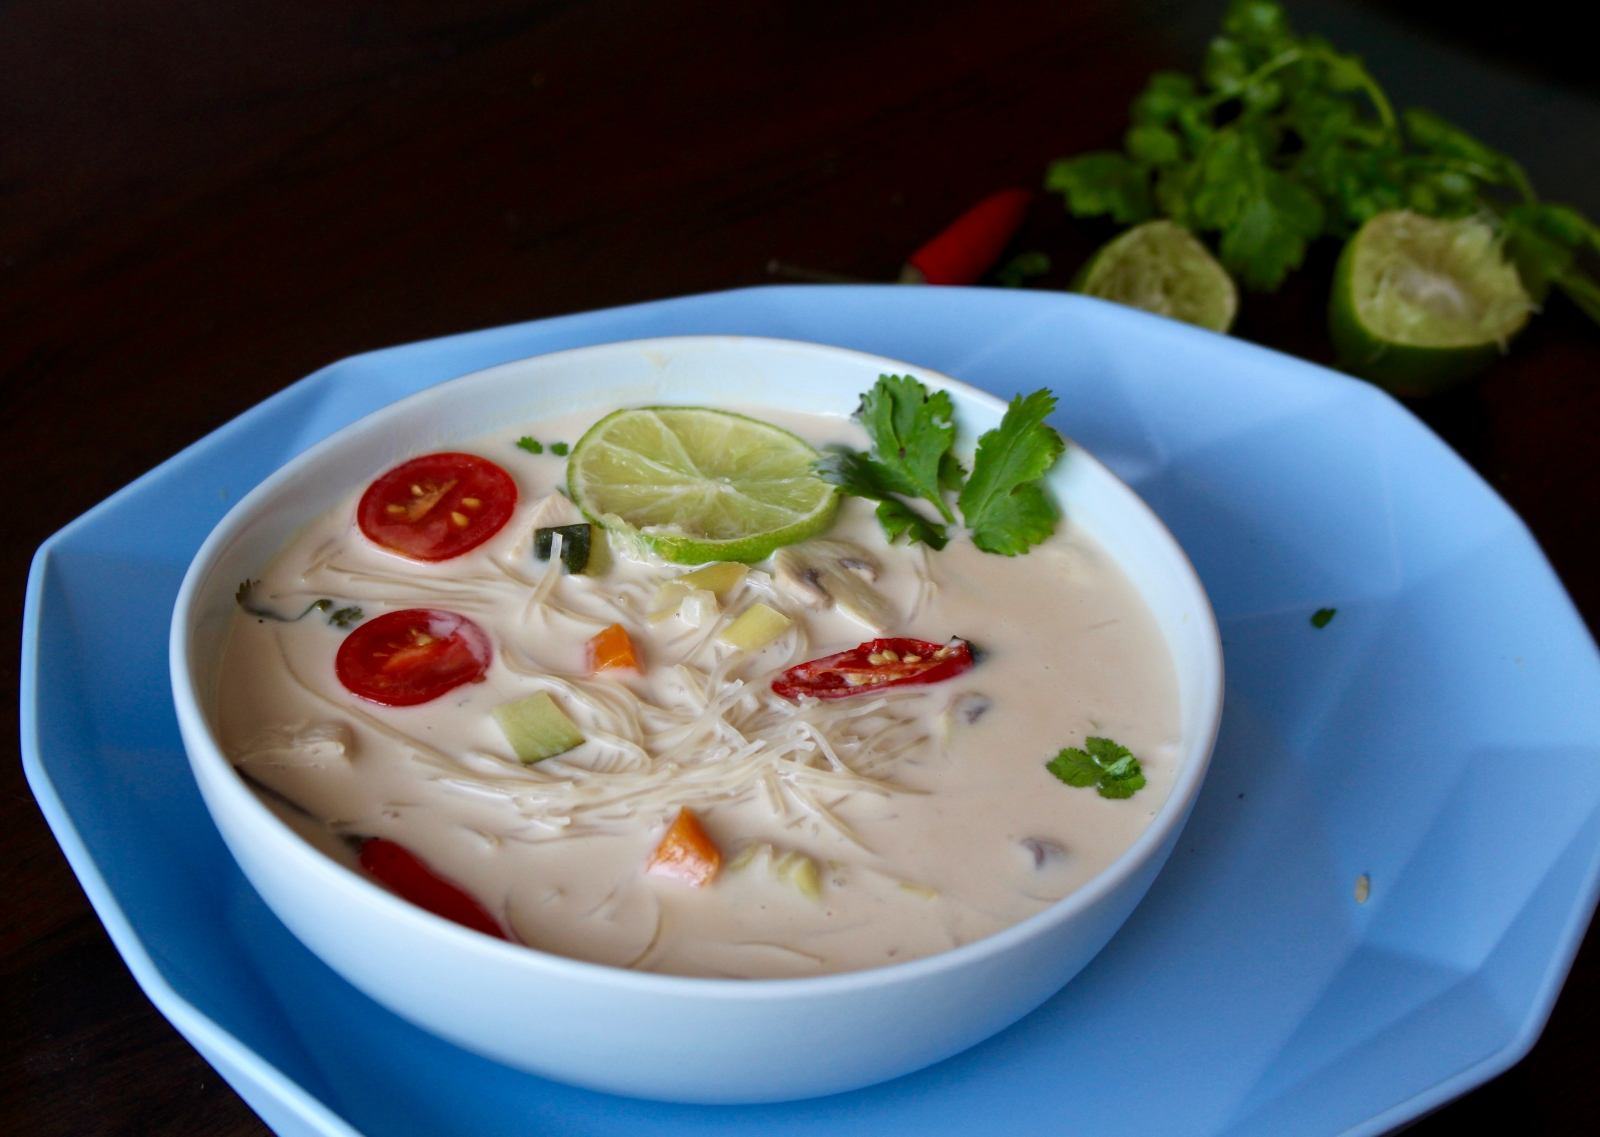 Vegetable Coconut Milk Soup With Vermicelli Noodles Recipe